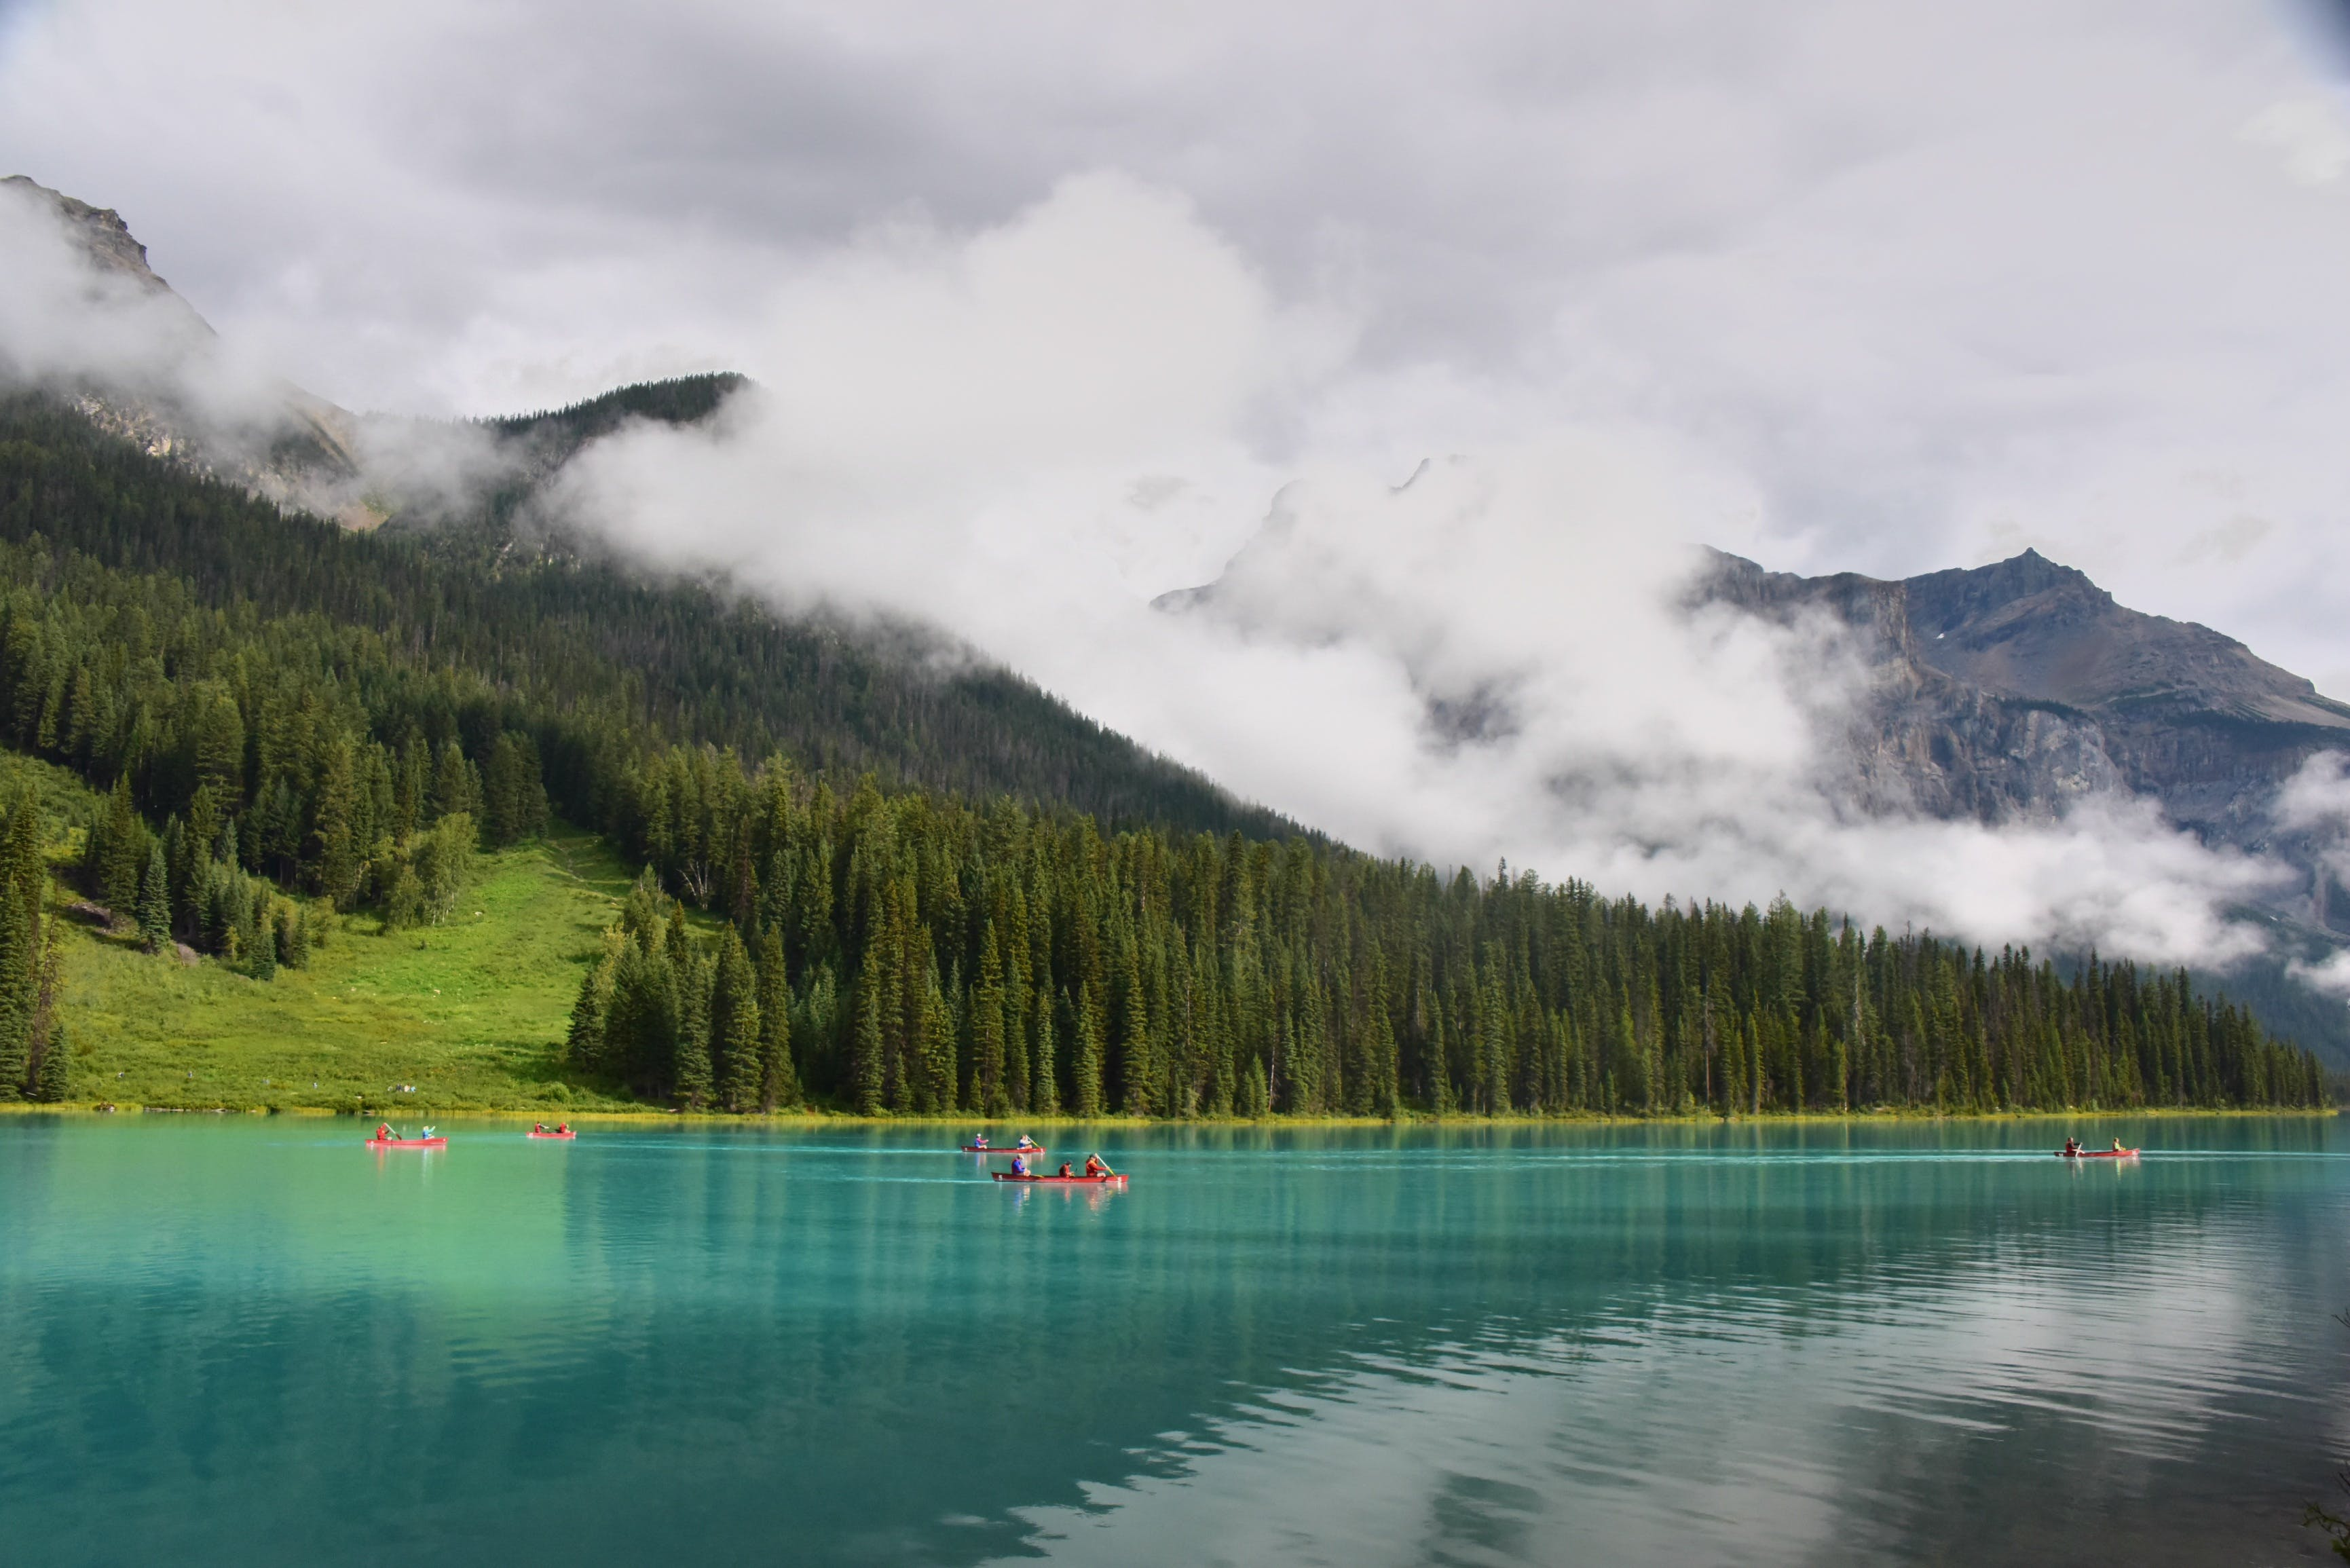 People Riding Boat on Lake